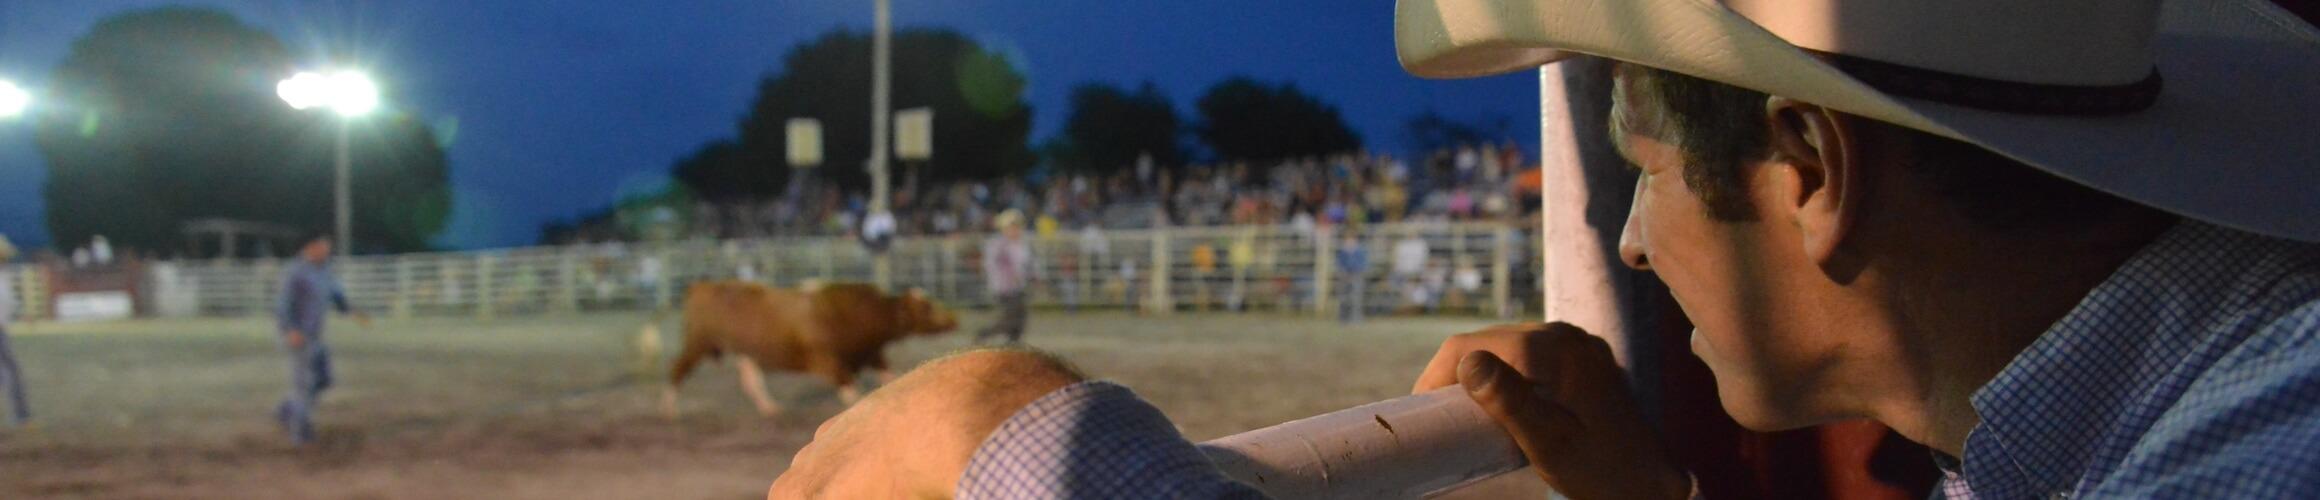 Cowboy 466551